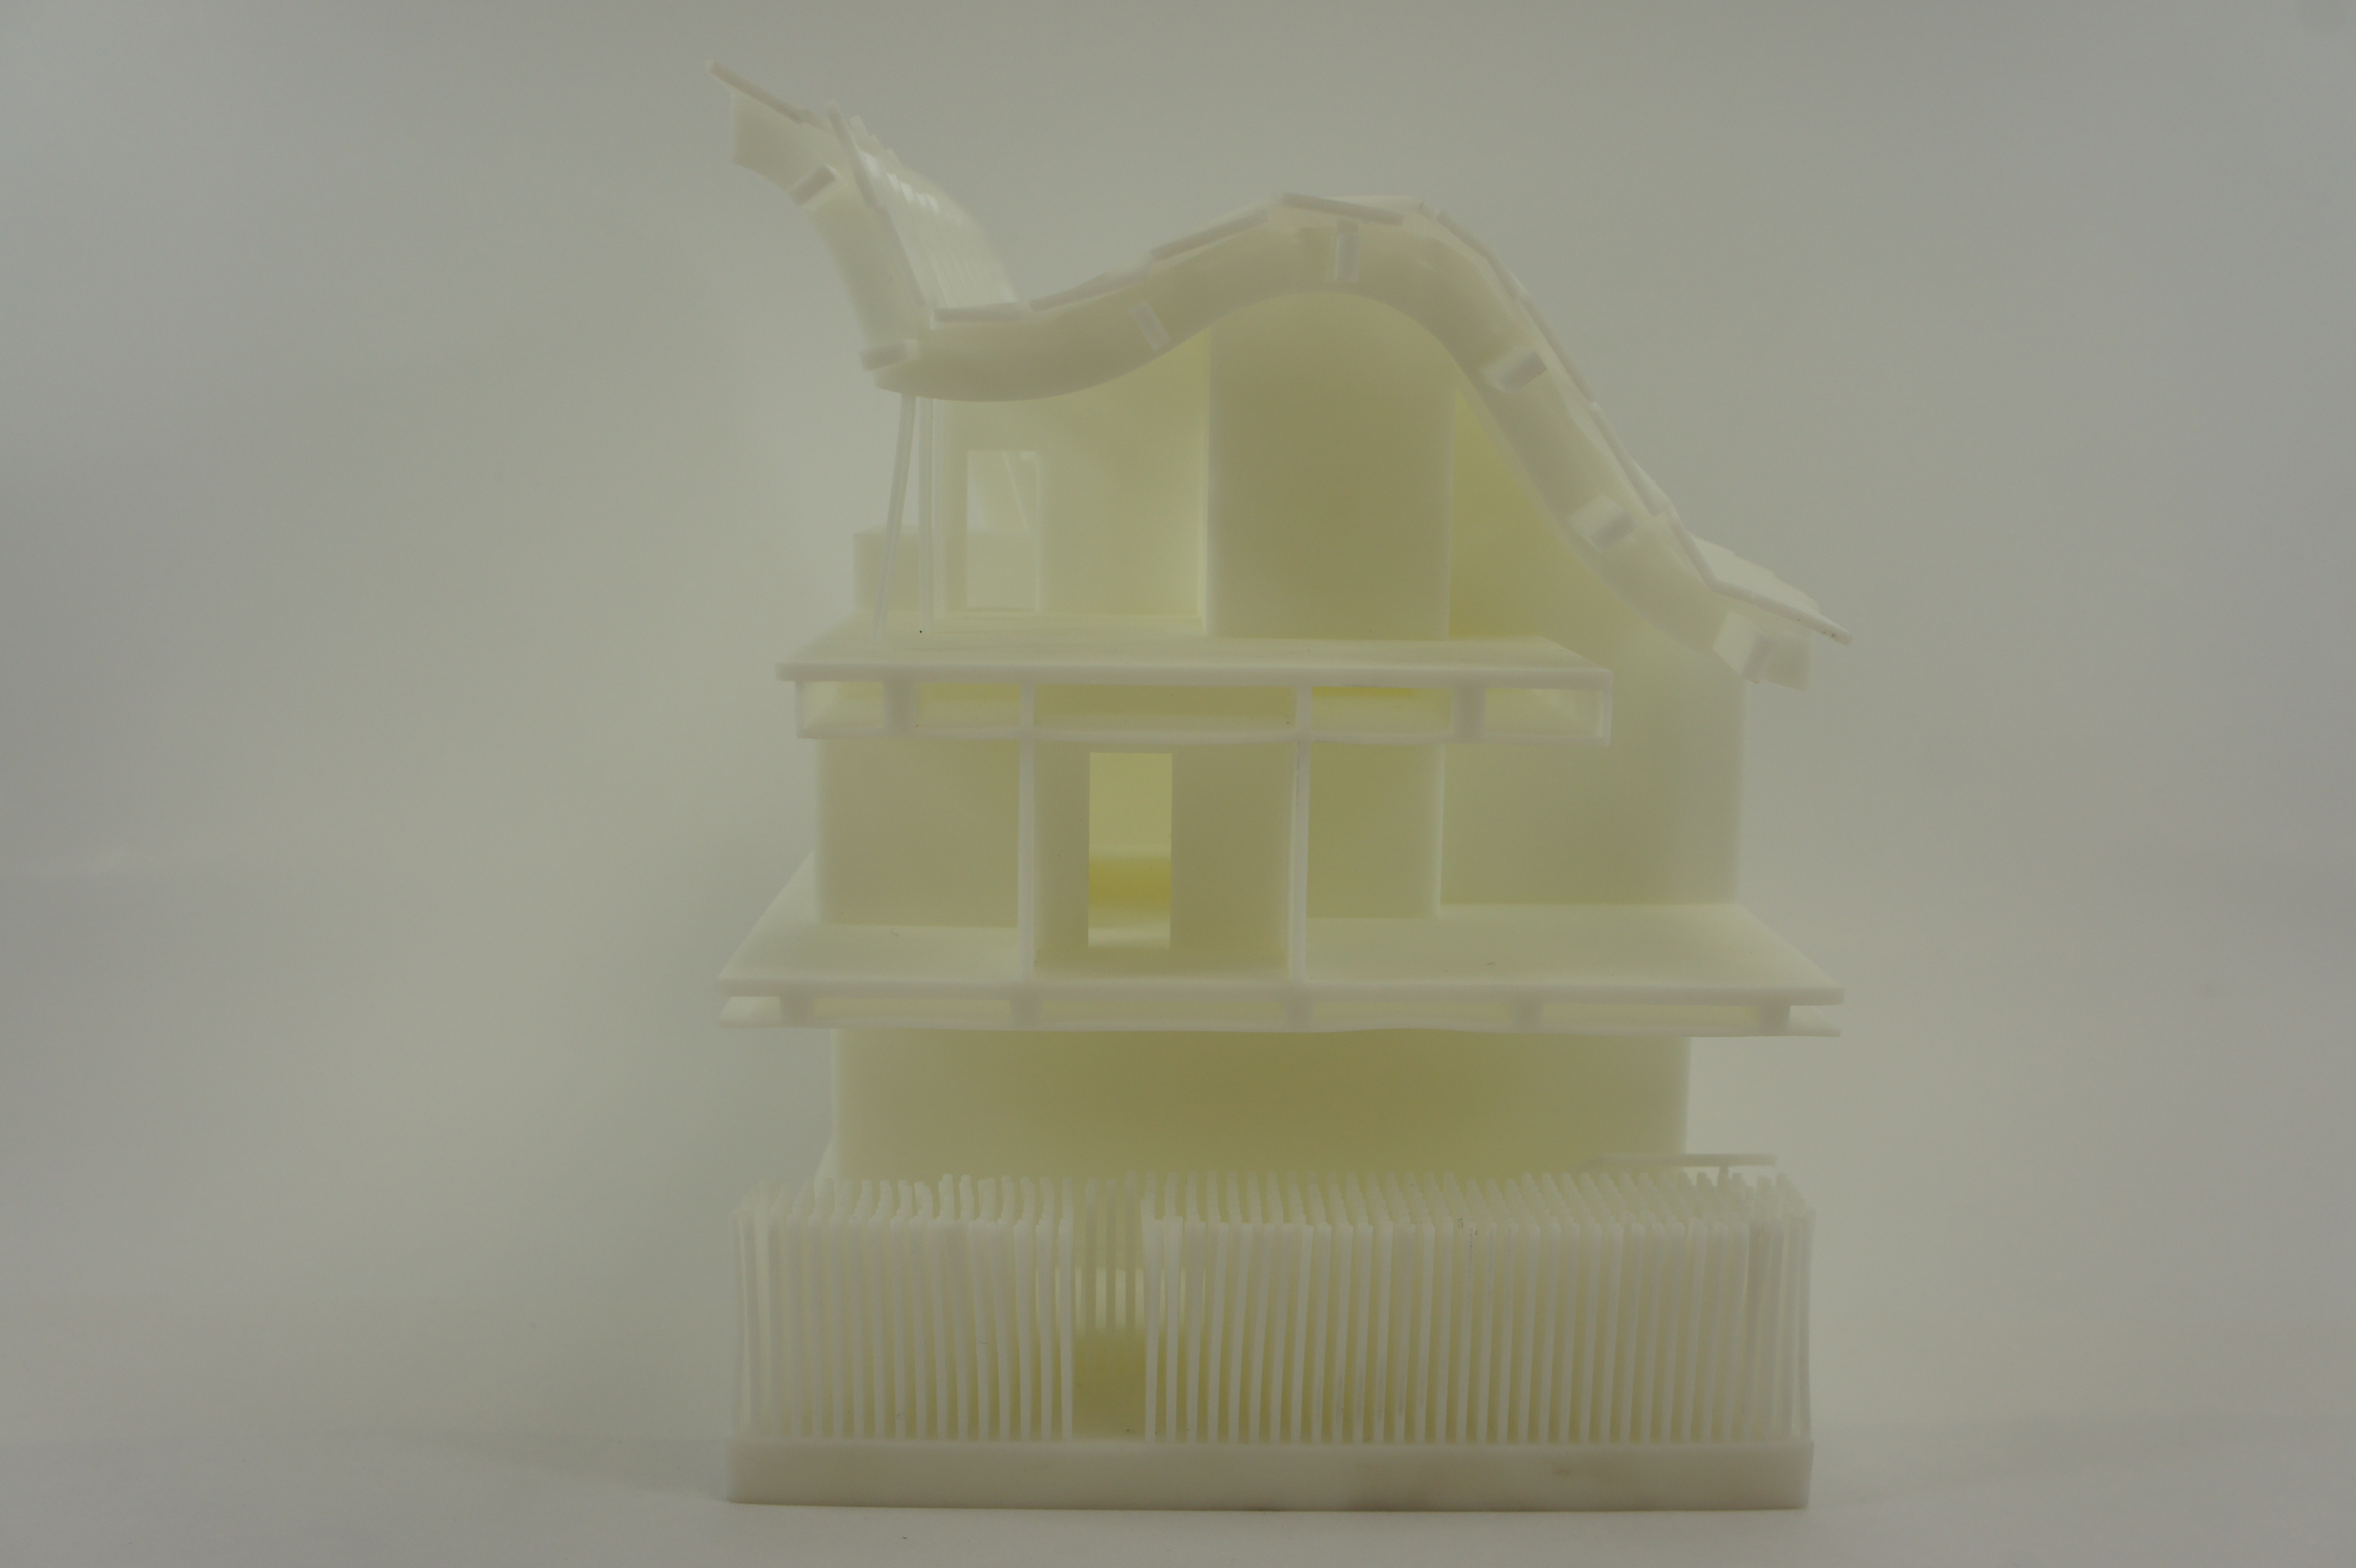 3D Print split China house side 3